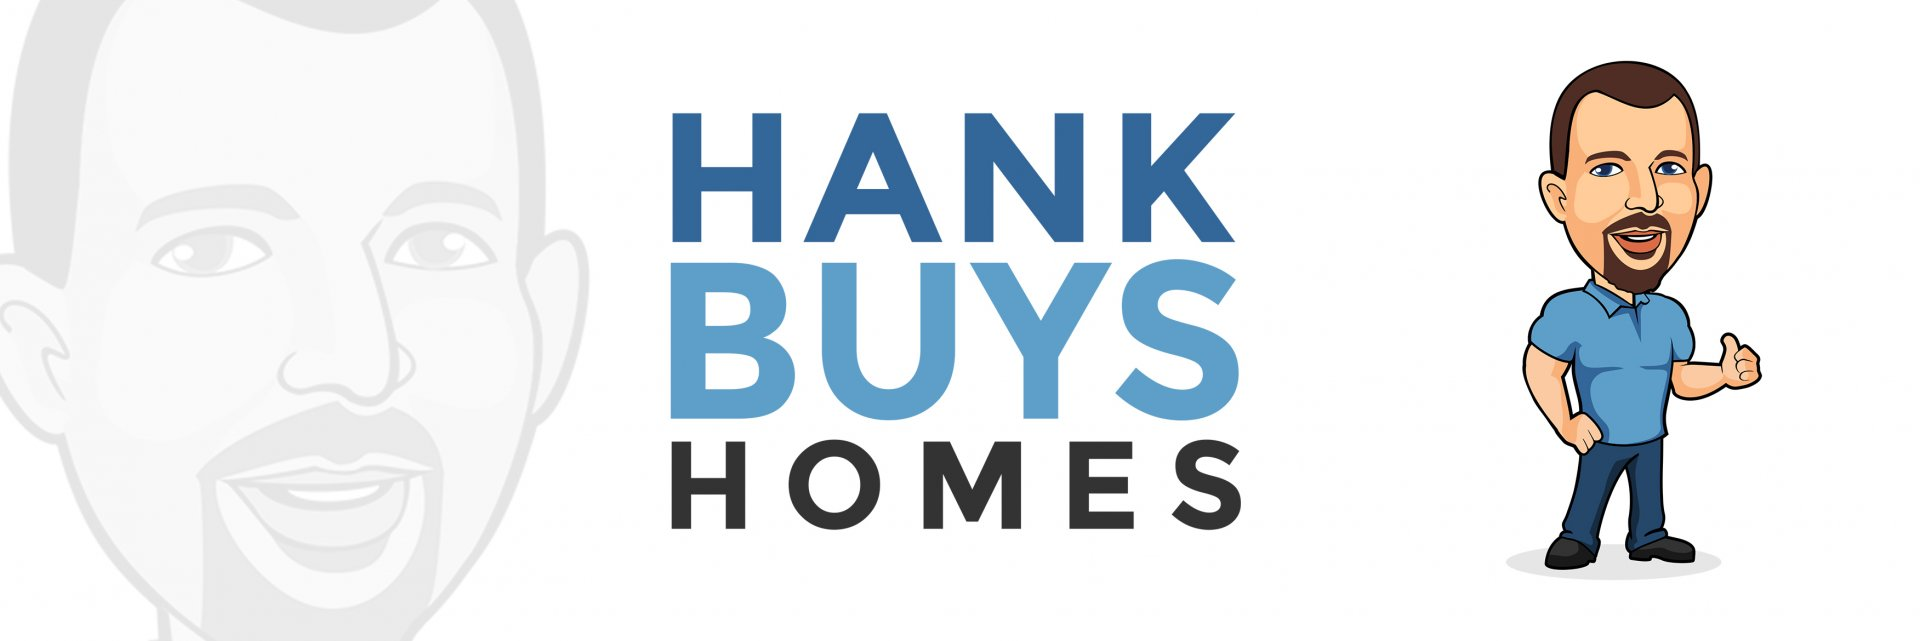 Hank Buys Homes logo